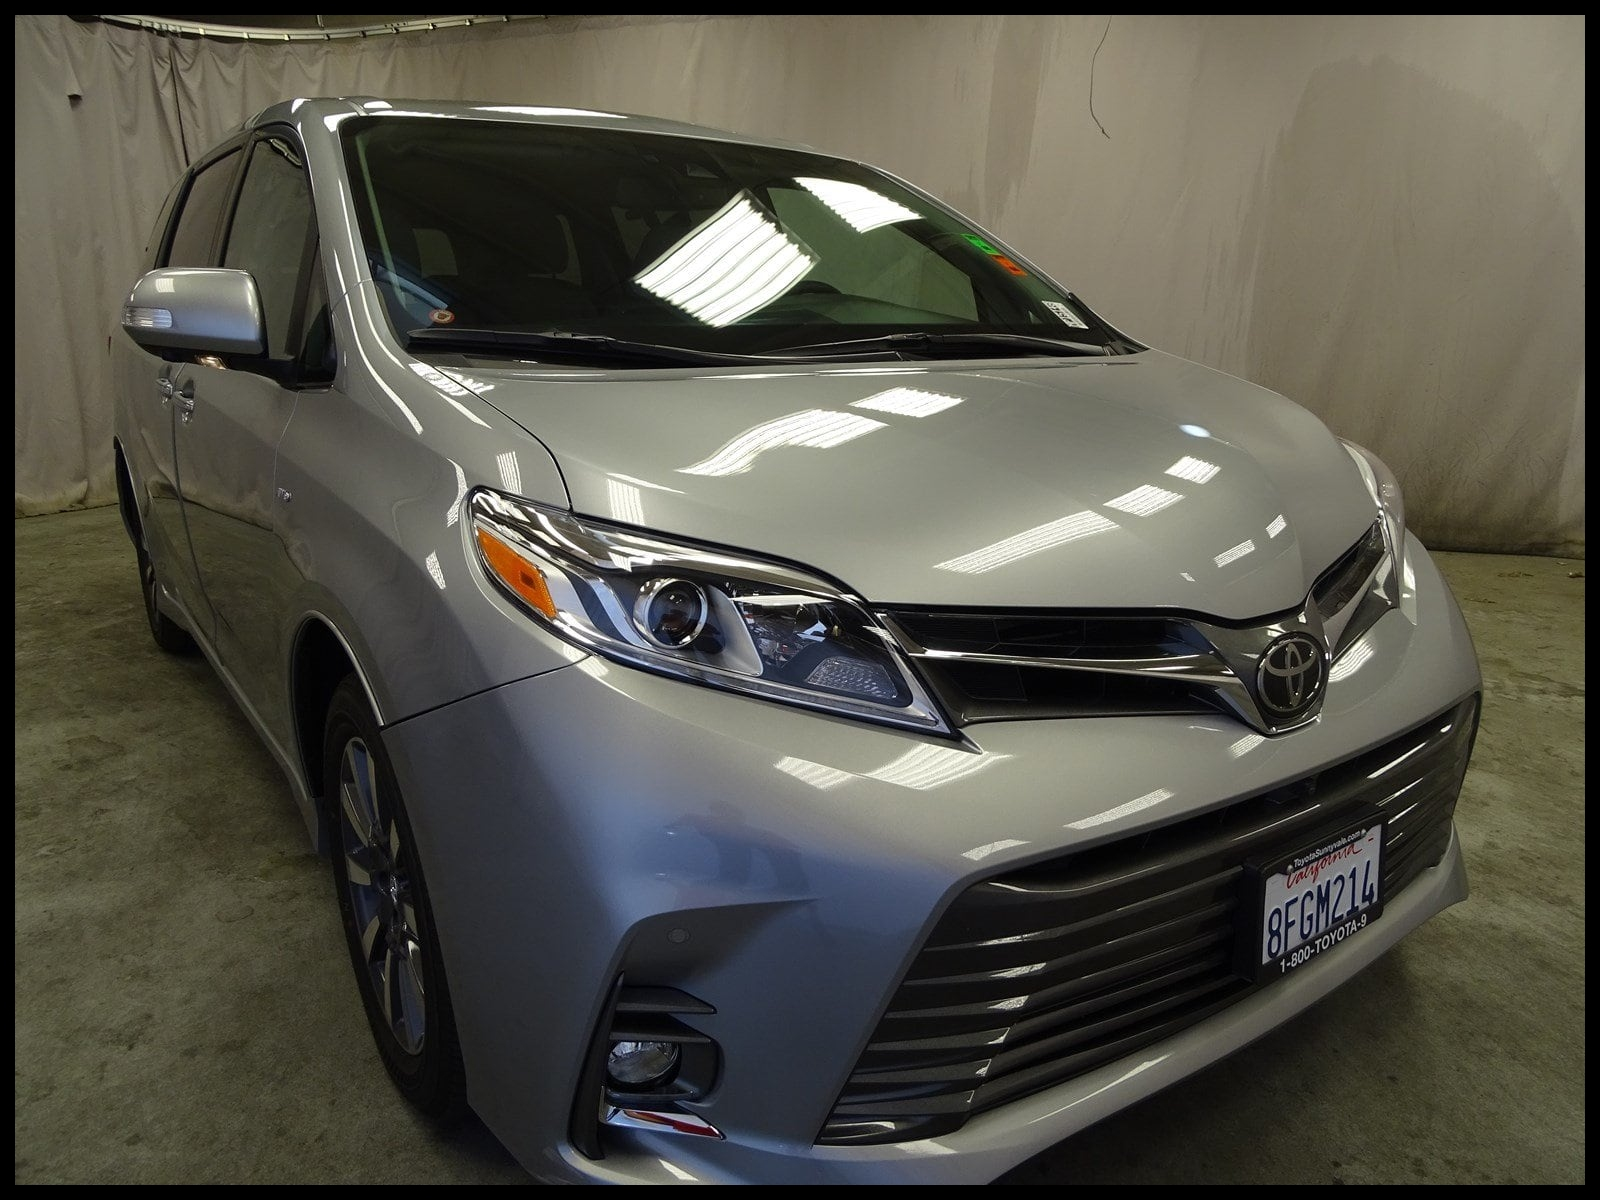 Used 2018 Toyota Sienna Limited Premium 7 Passenger Van Passenger Van Sunnyvale CA